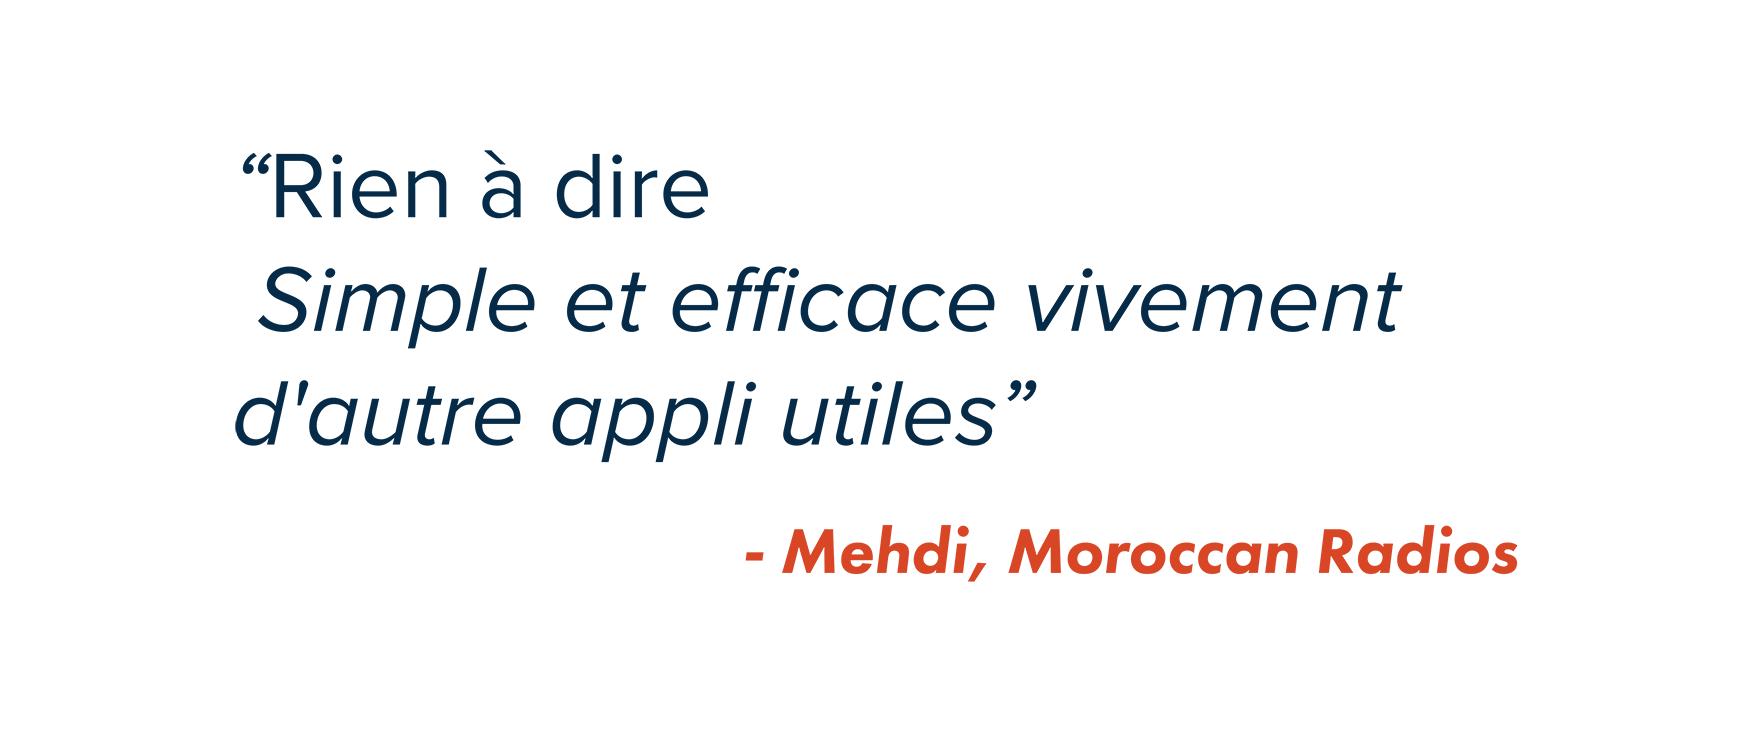 MoroccanTestimonial.png